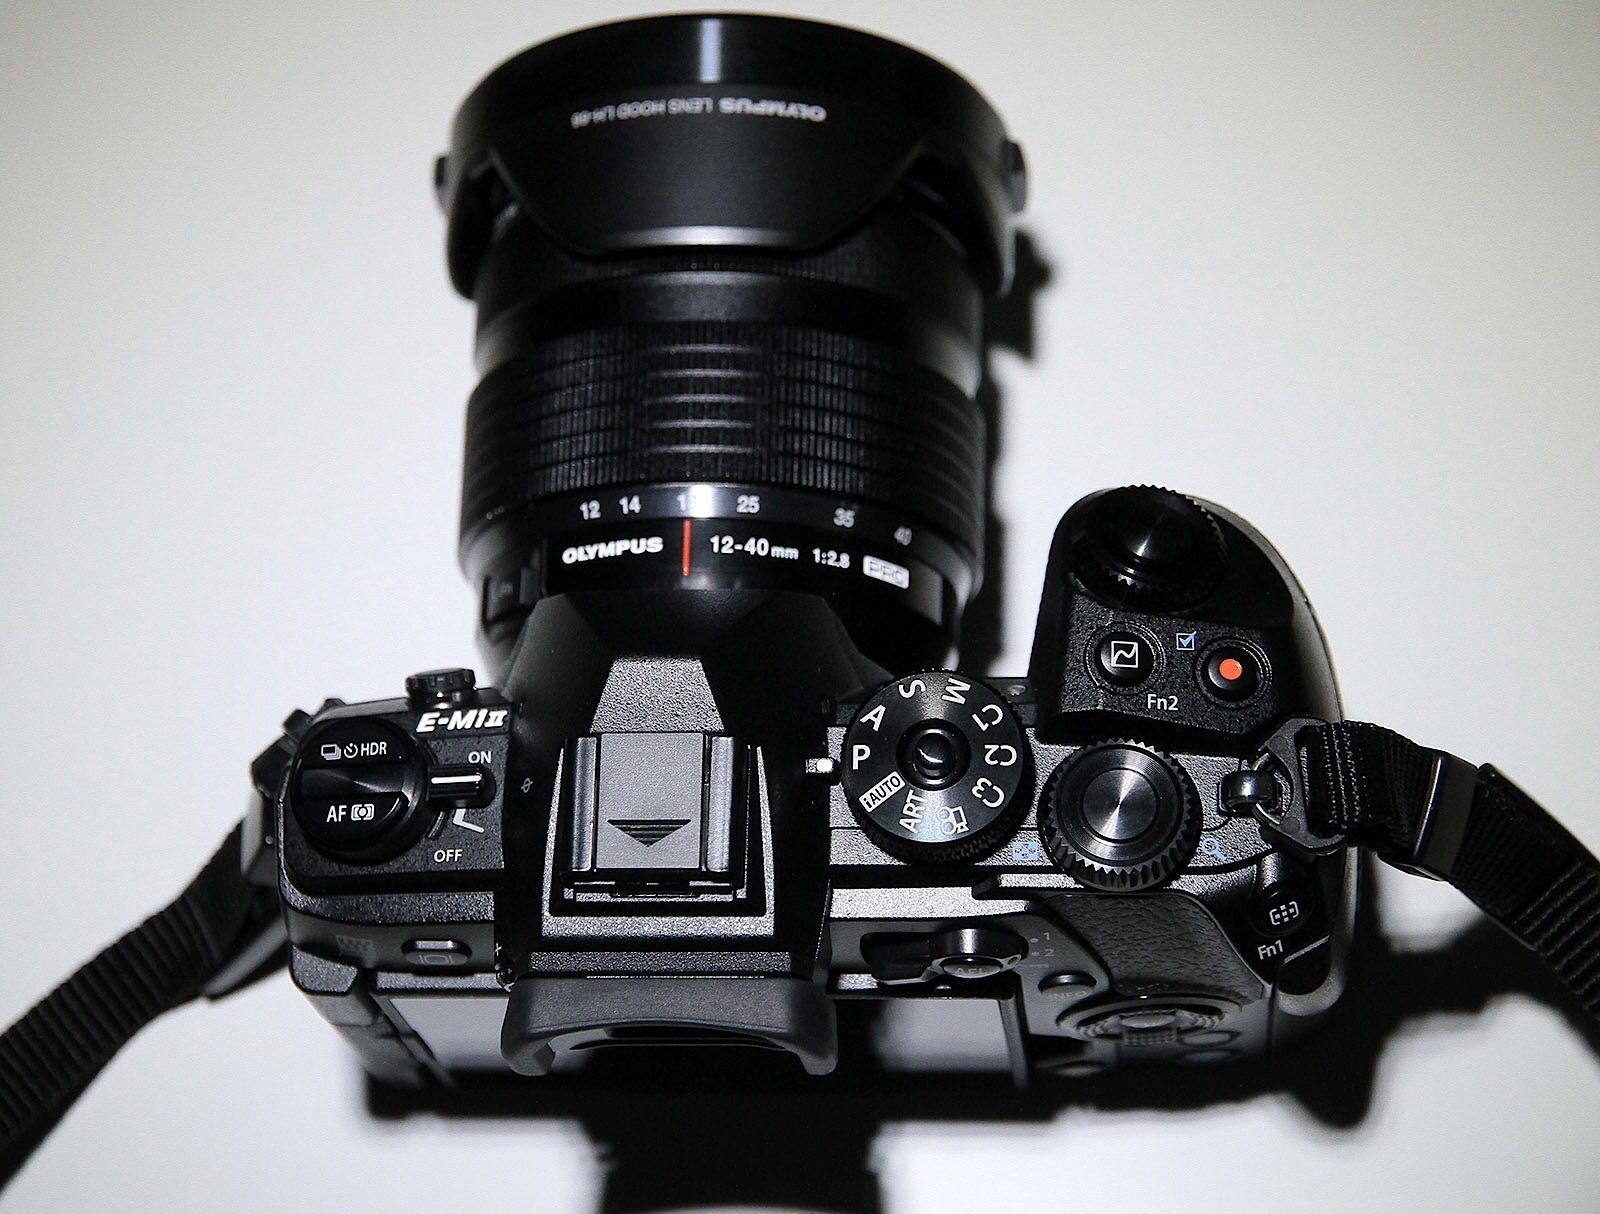 First Look At The Olympus Omd Em1 Mark Ii Mirrorless Camera